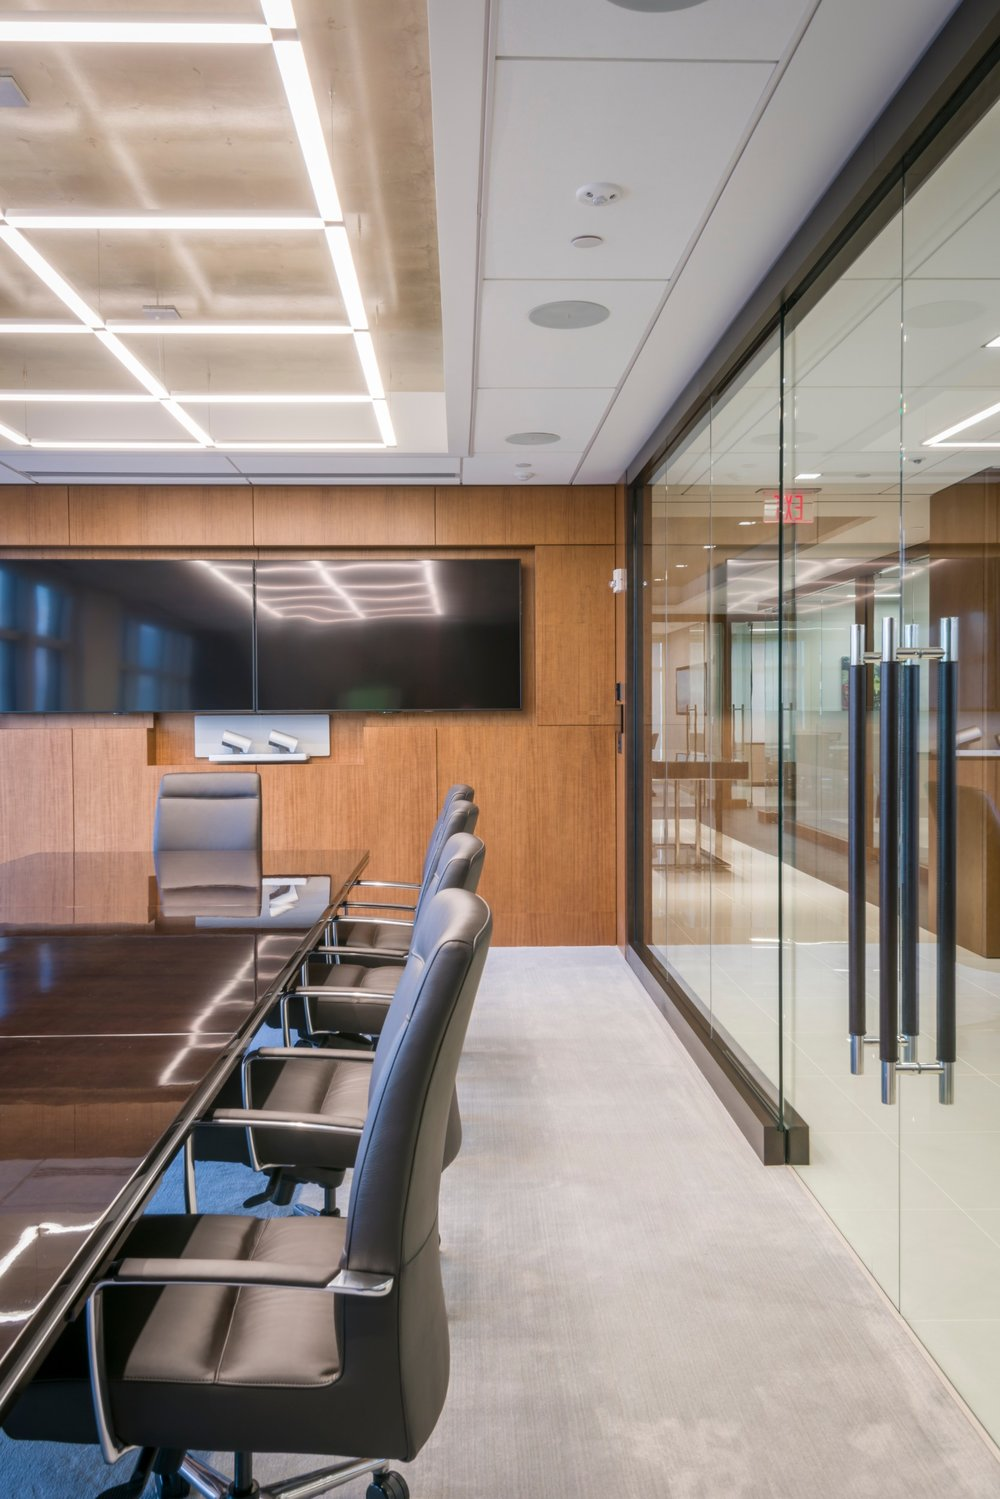 Corderman_Construction_Martignetti_Companies_Interior_Office_Buildout_Boardroom_Doors.jpg